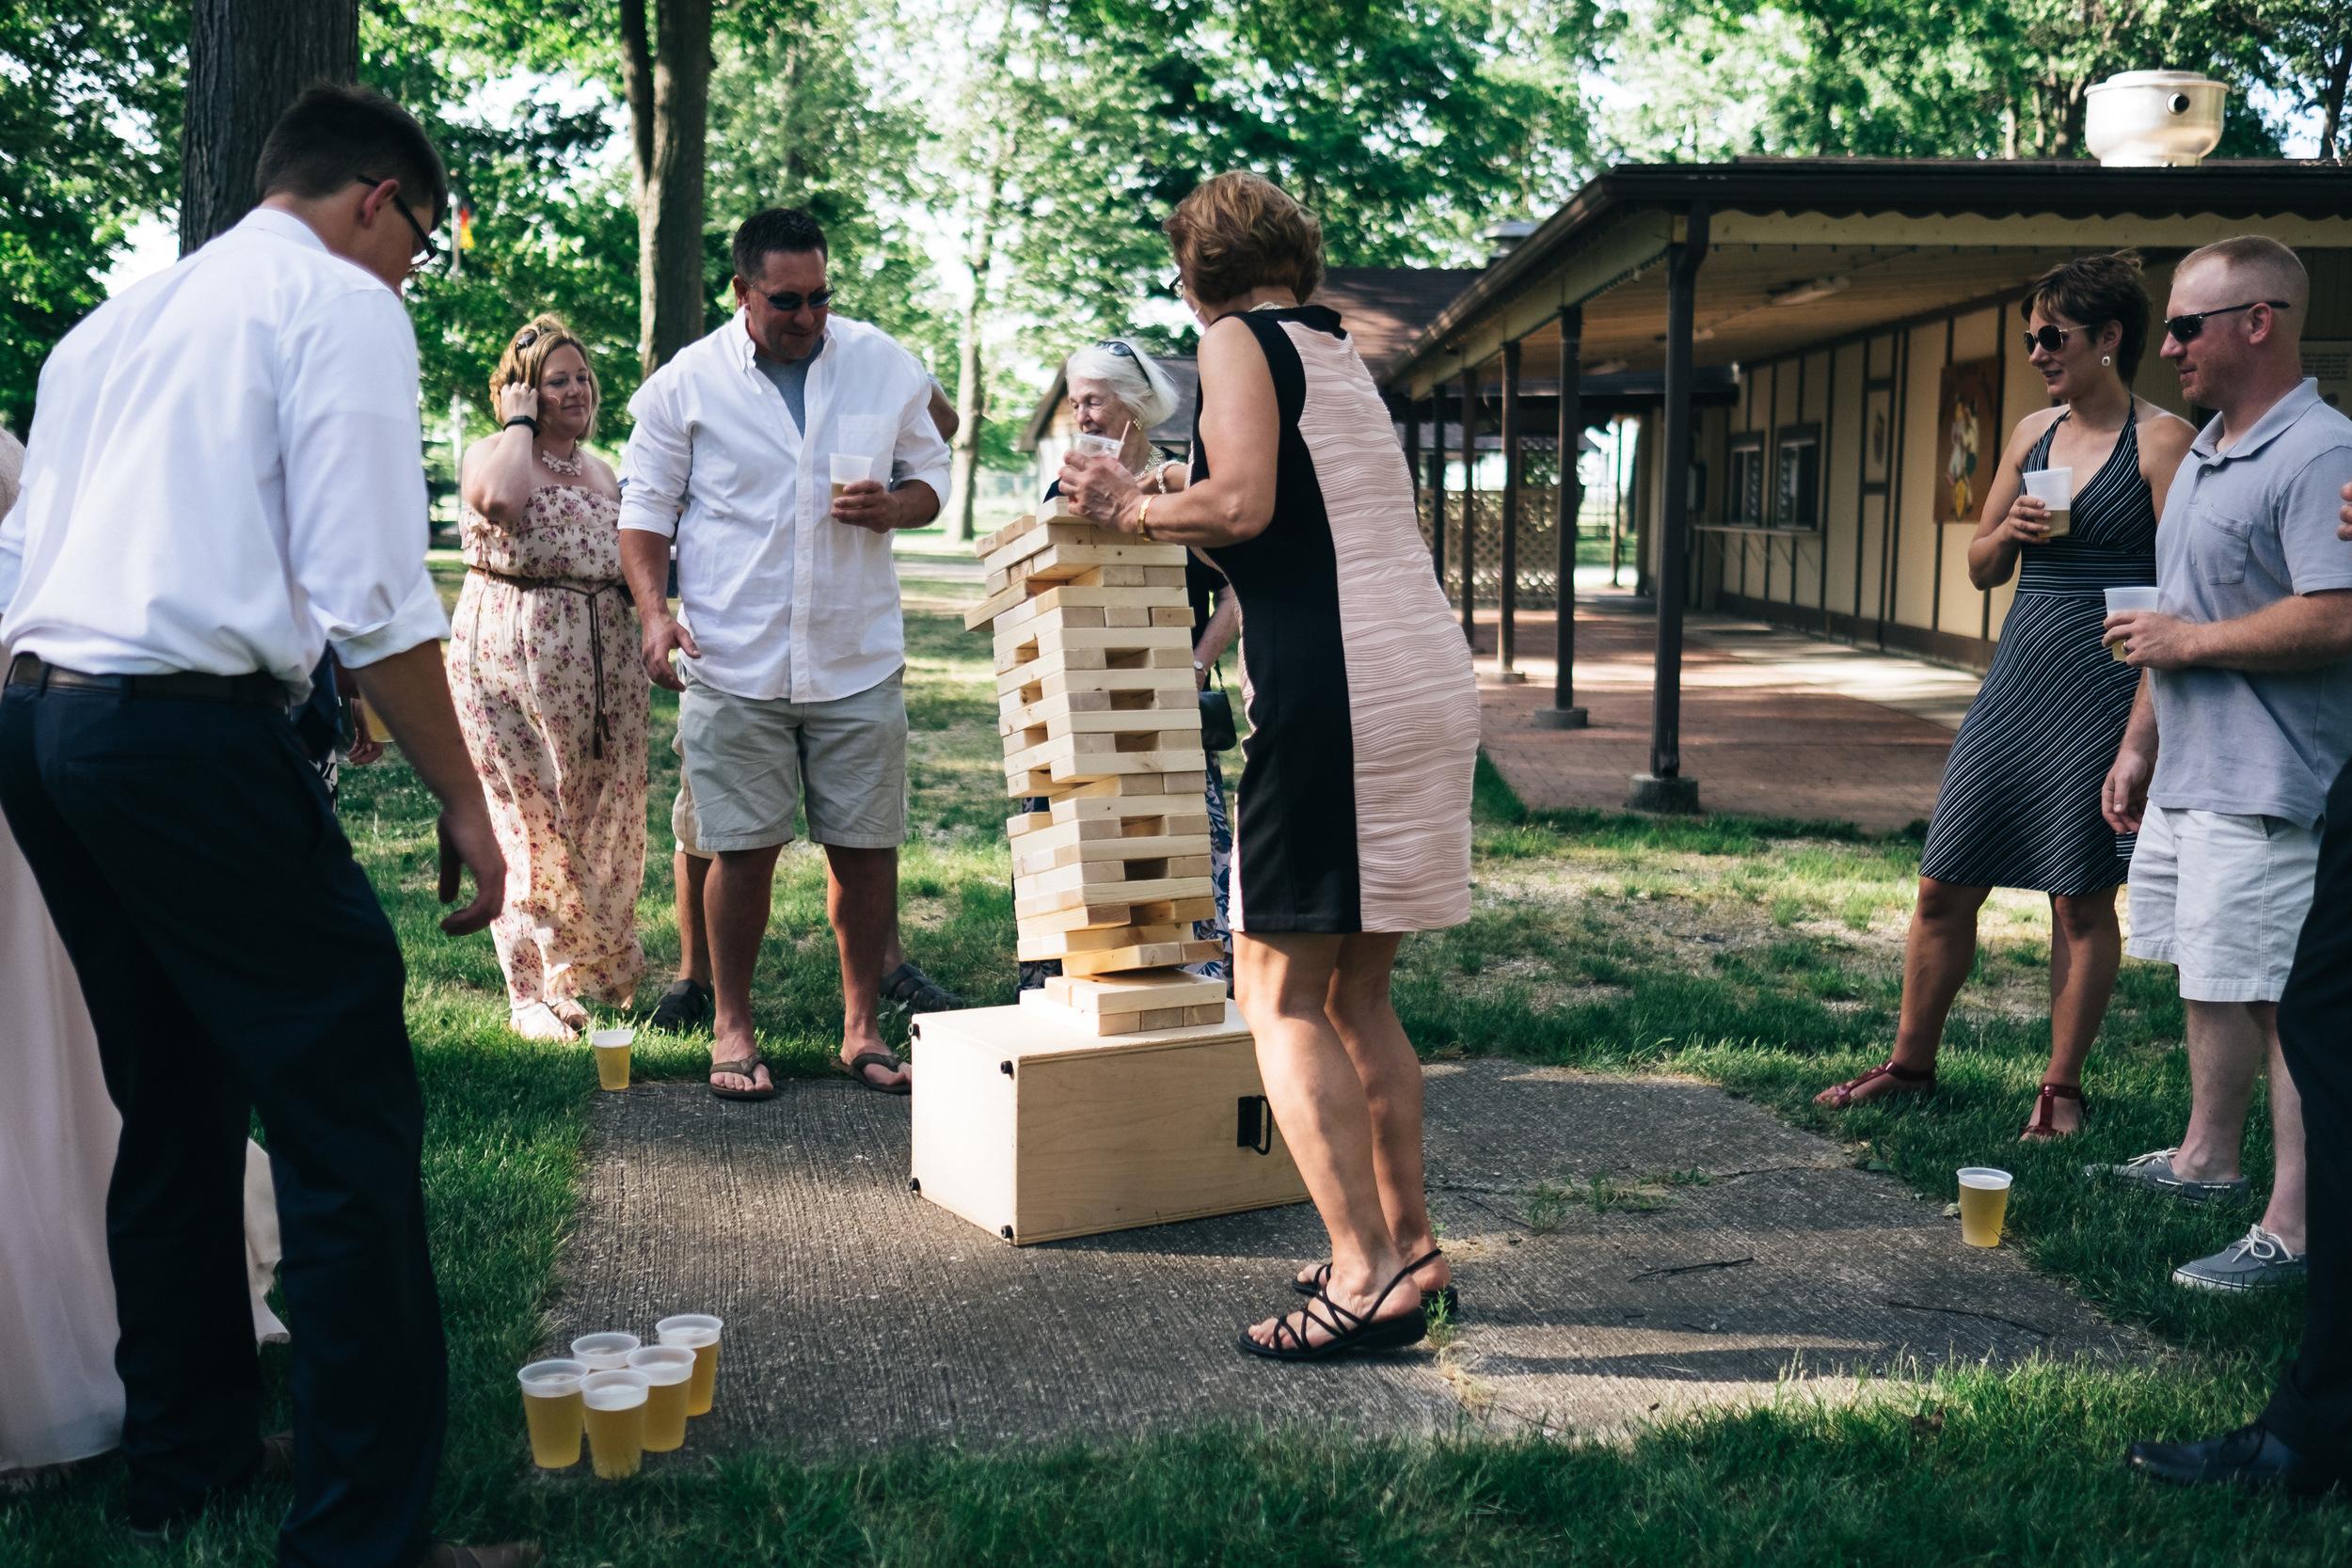 Wedding guests play outdoor games at wedding reception.